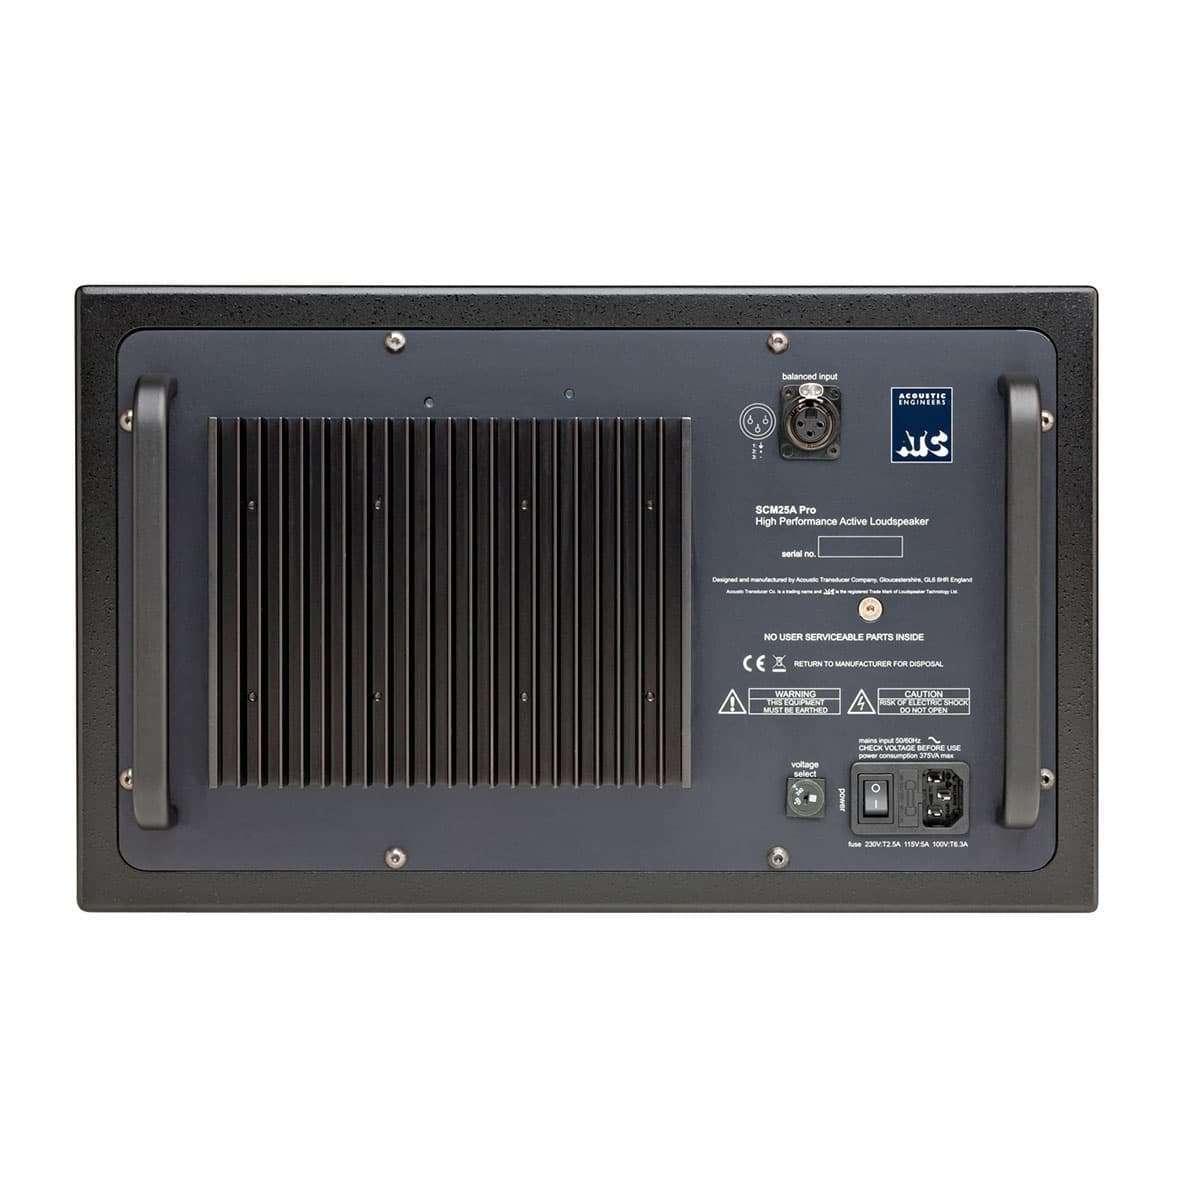 ATC SCM25A 02 Pro Audio, Audio Monitors, Studio Monitor